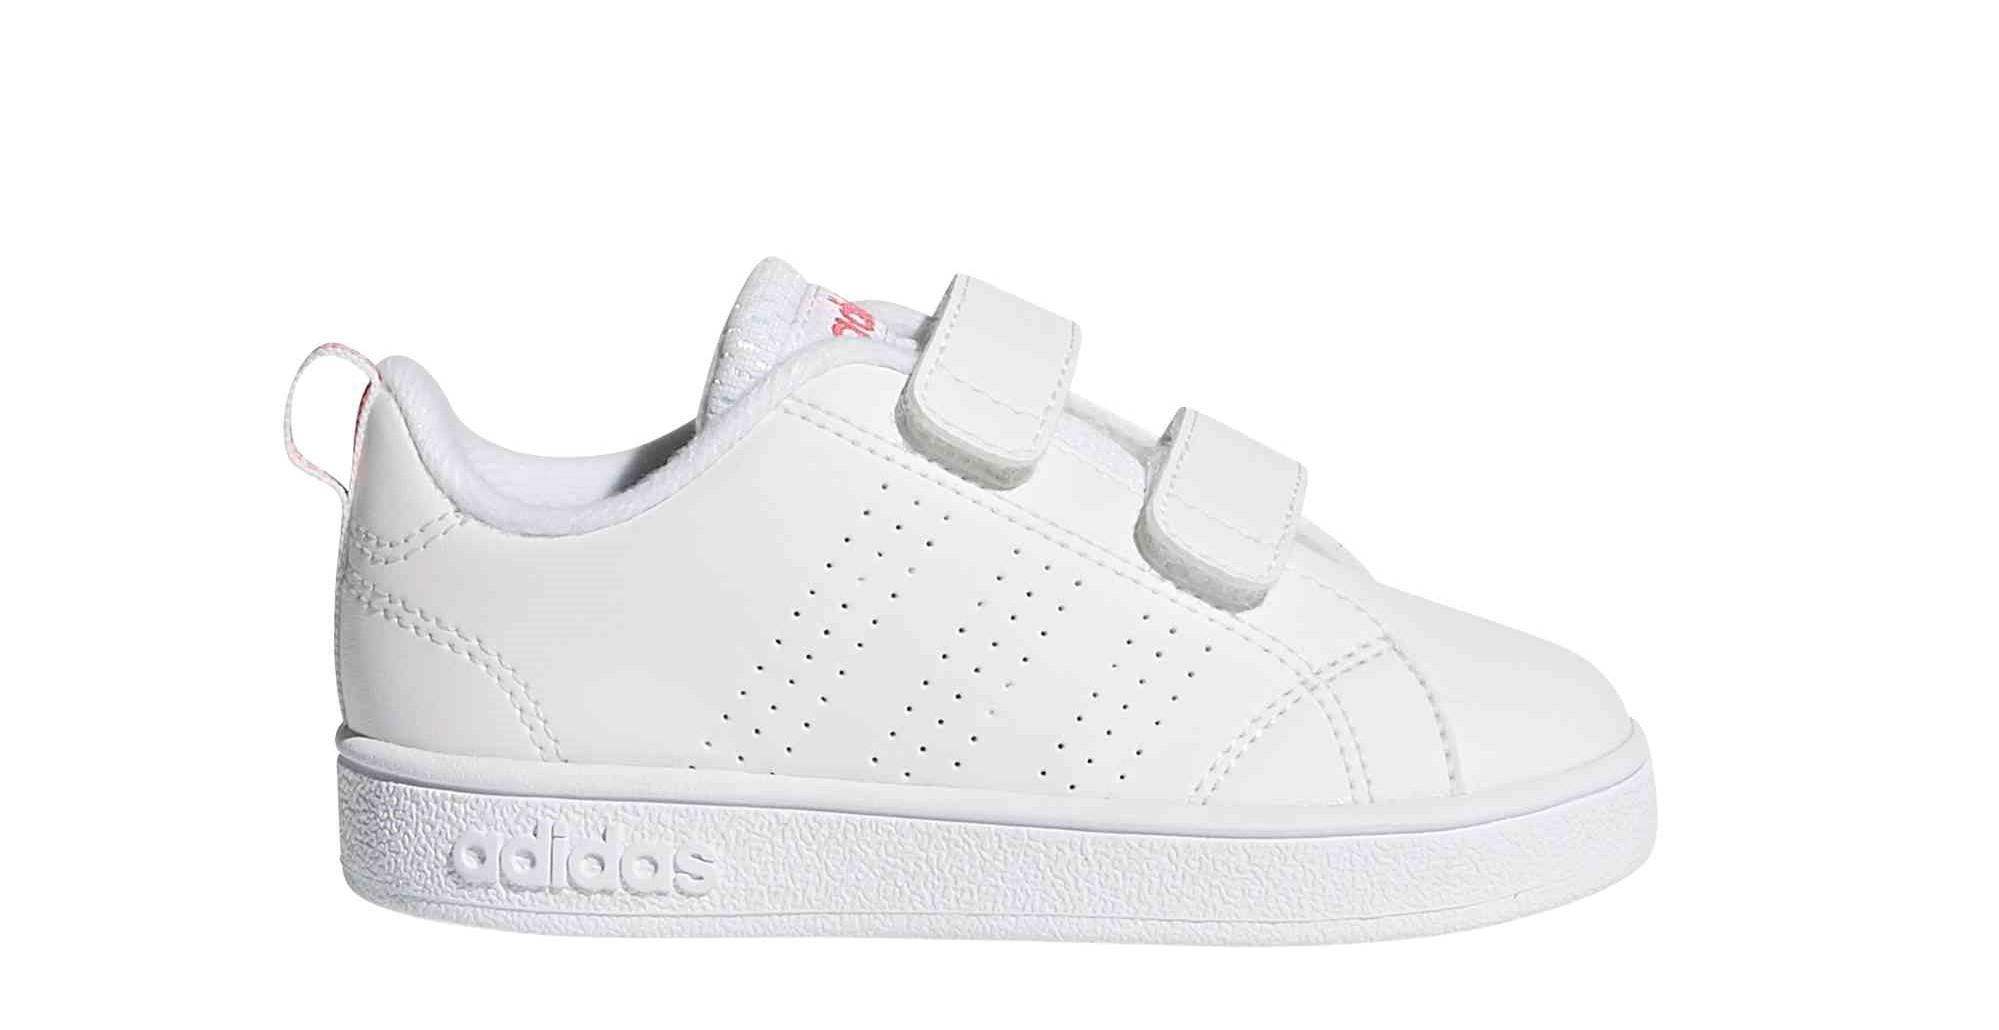 Adidas babysneaker groen en wit